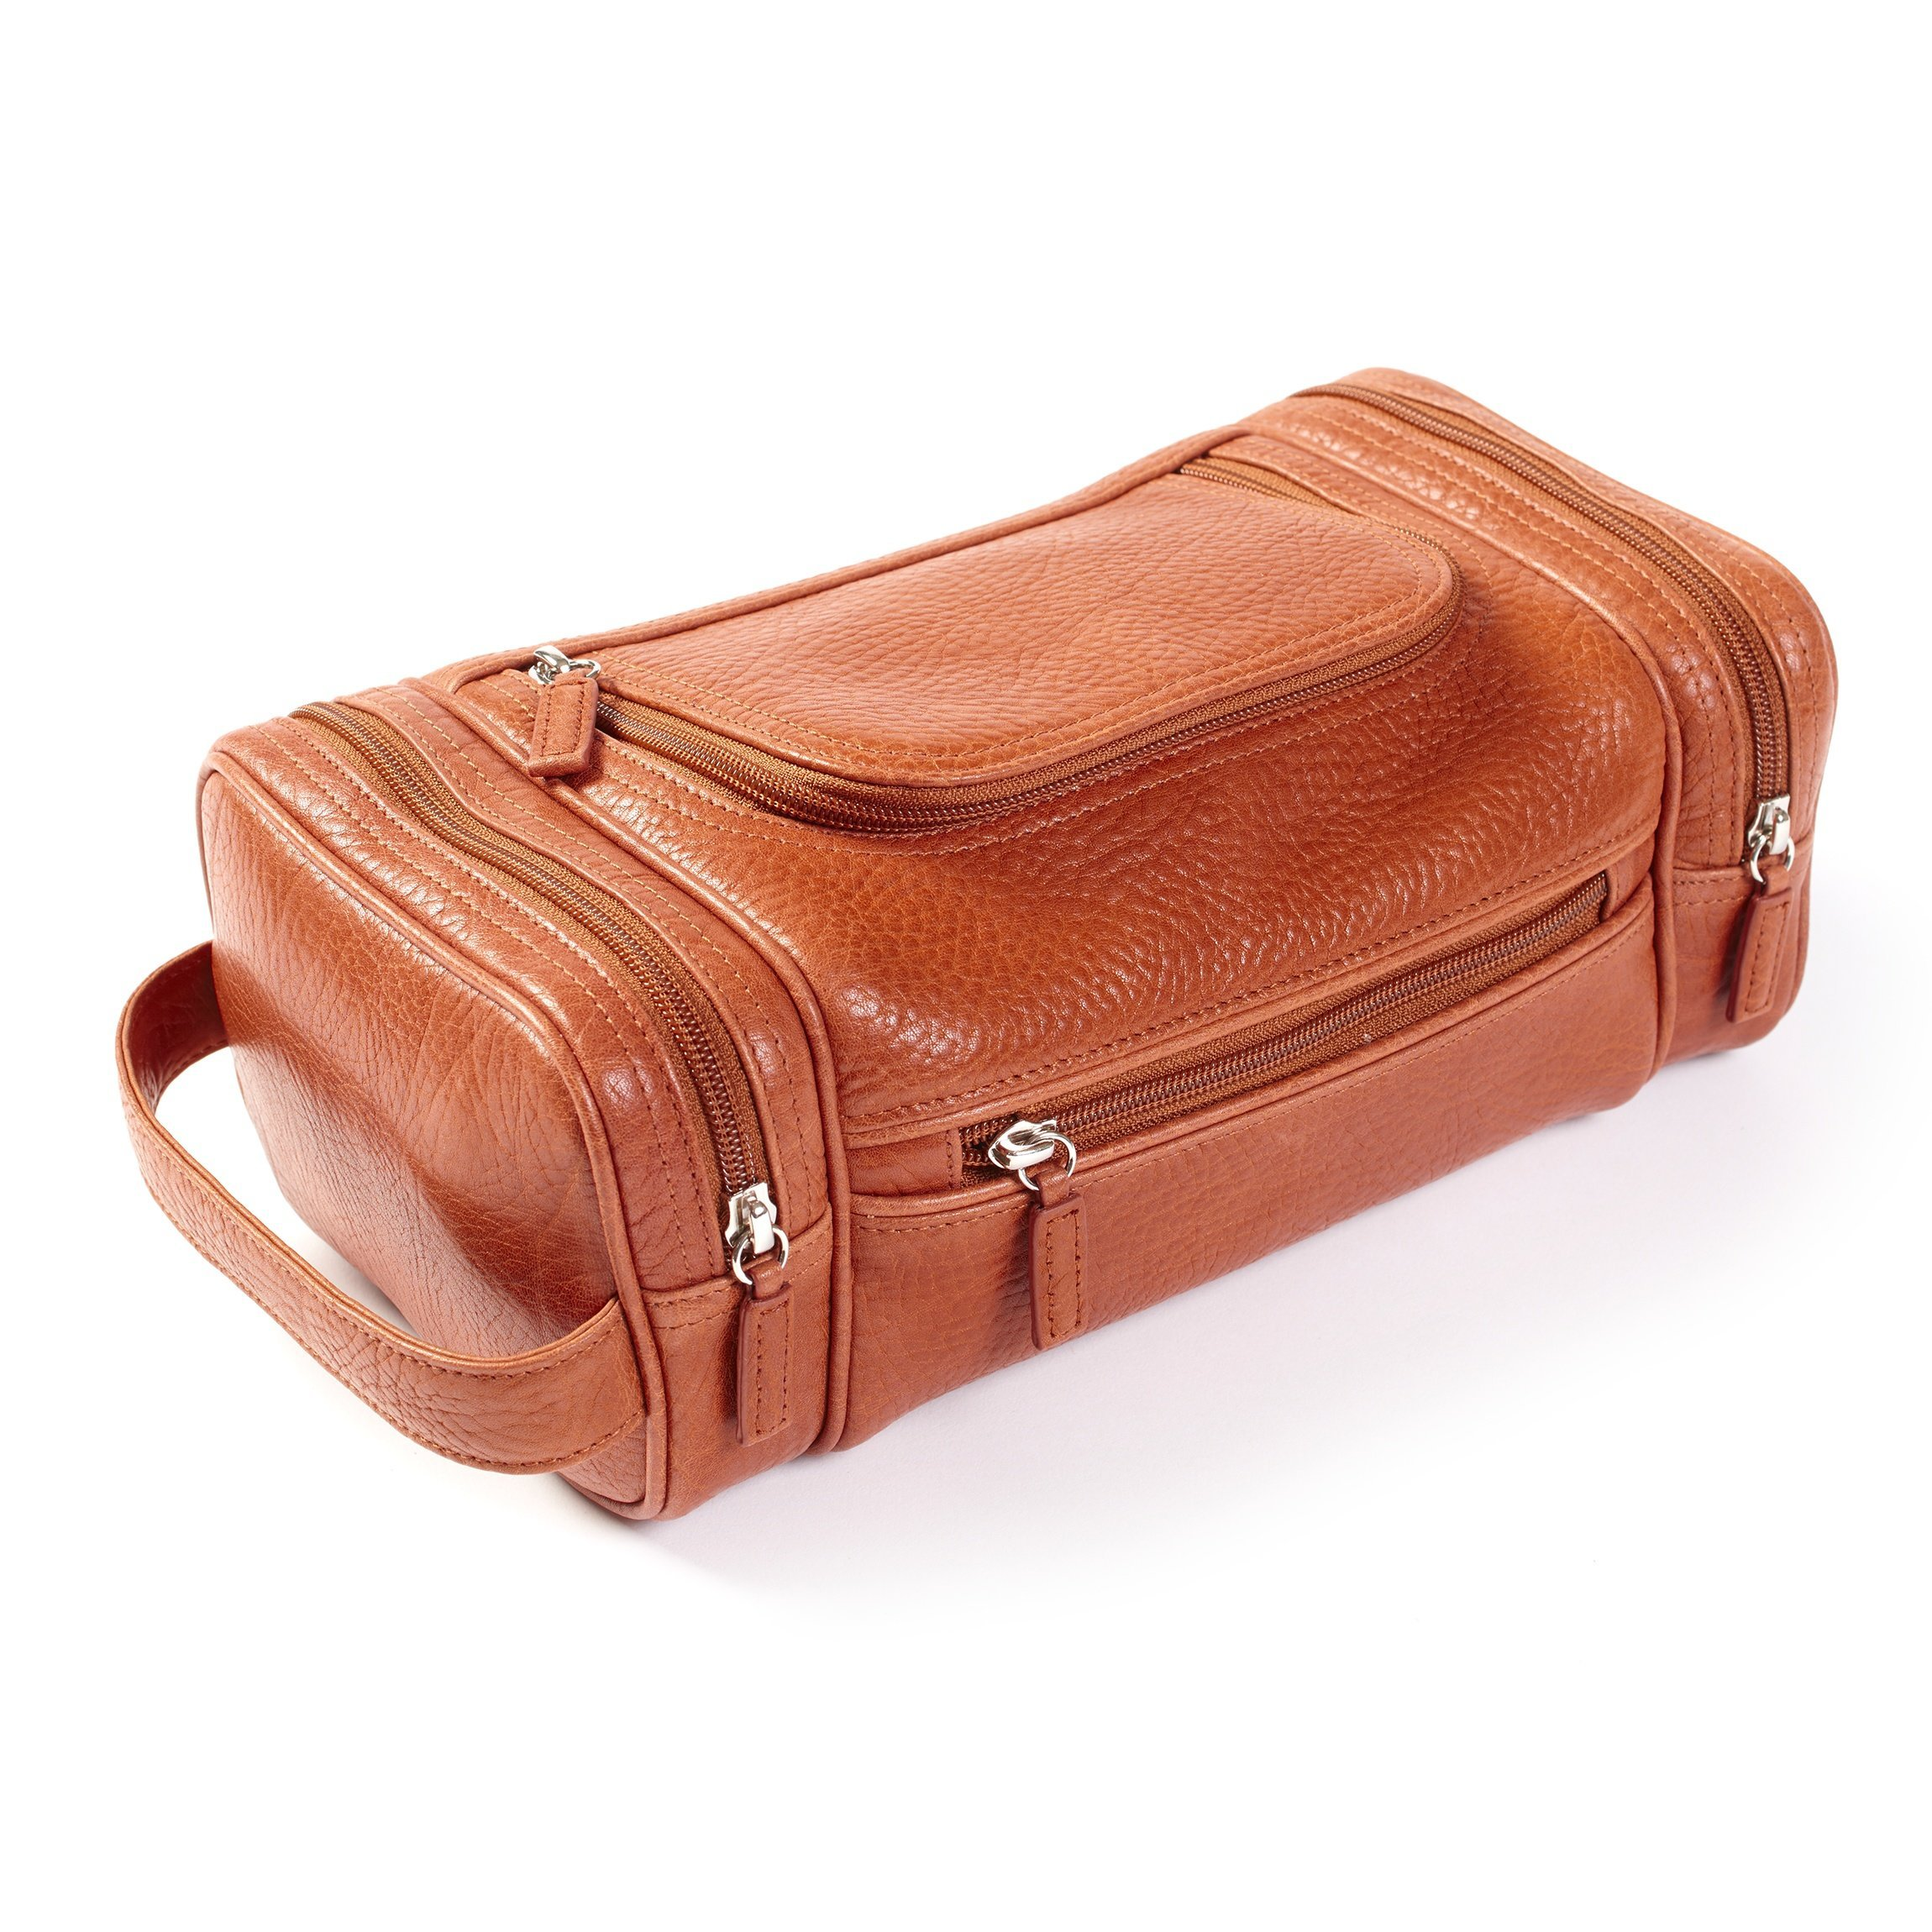 Multi Pocket Toiletry Bag - Italian Leather - Whiskey (brown)